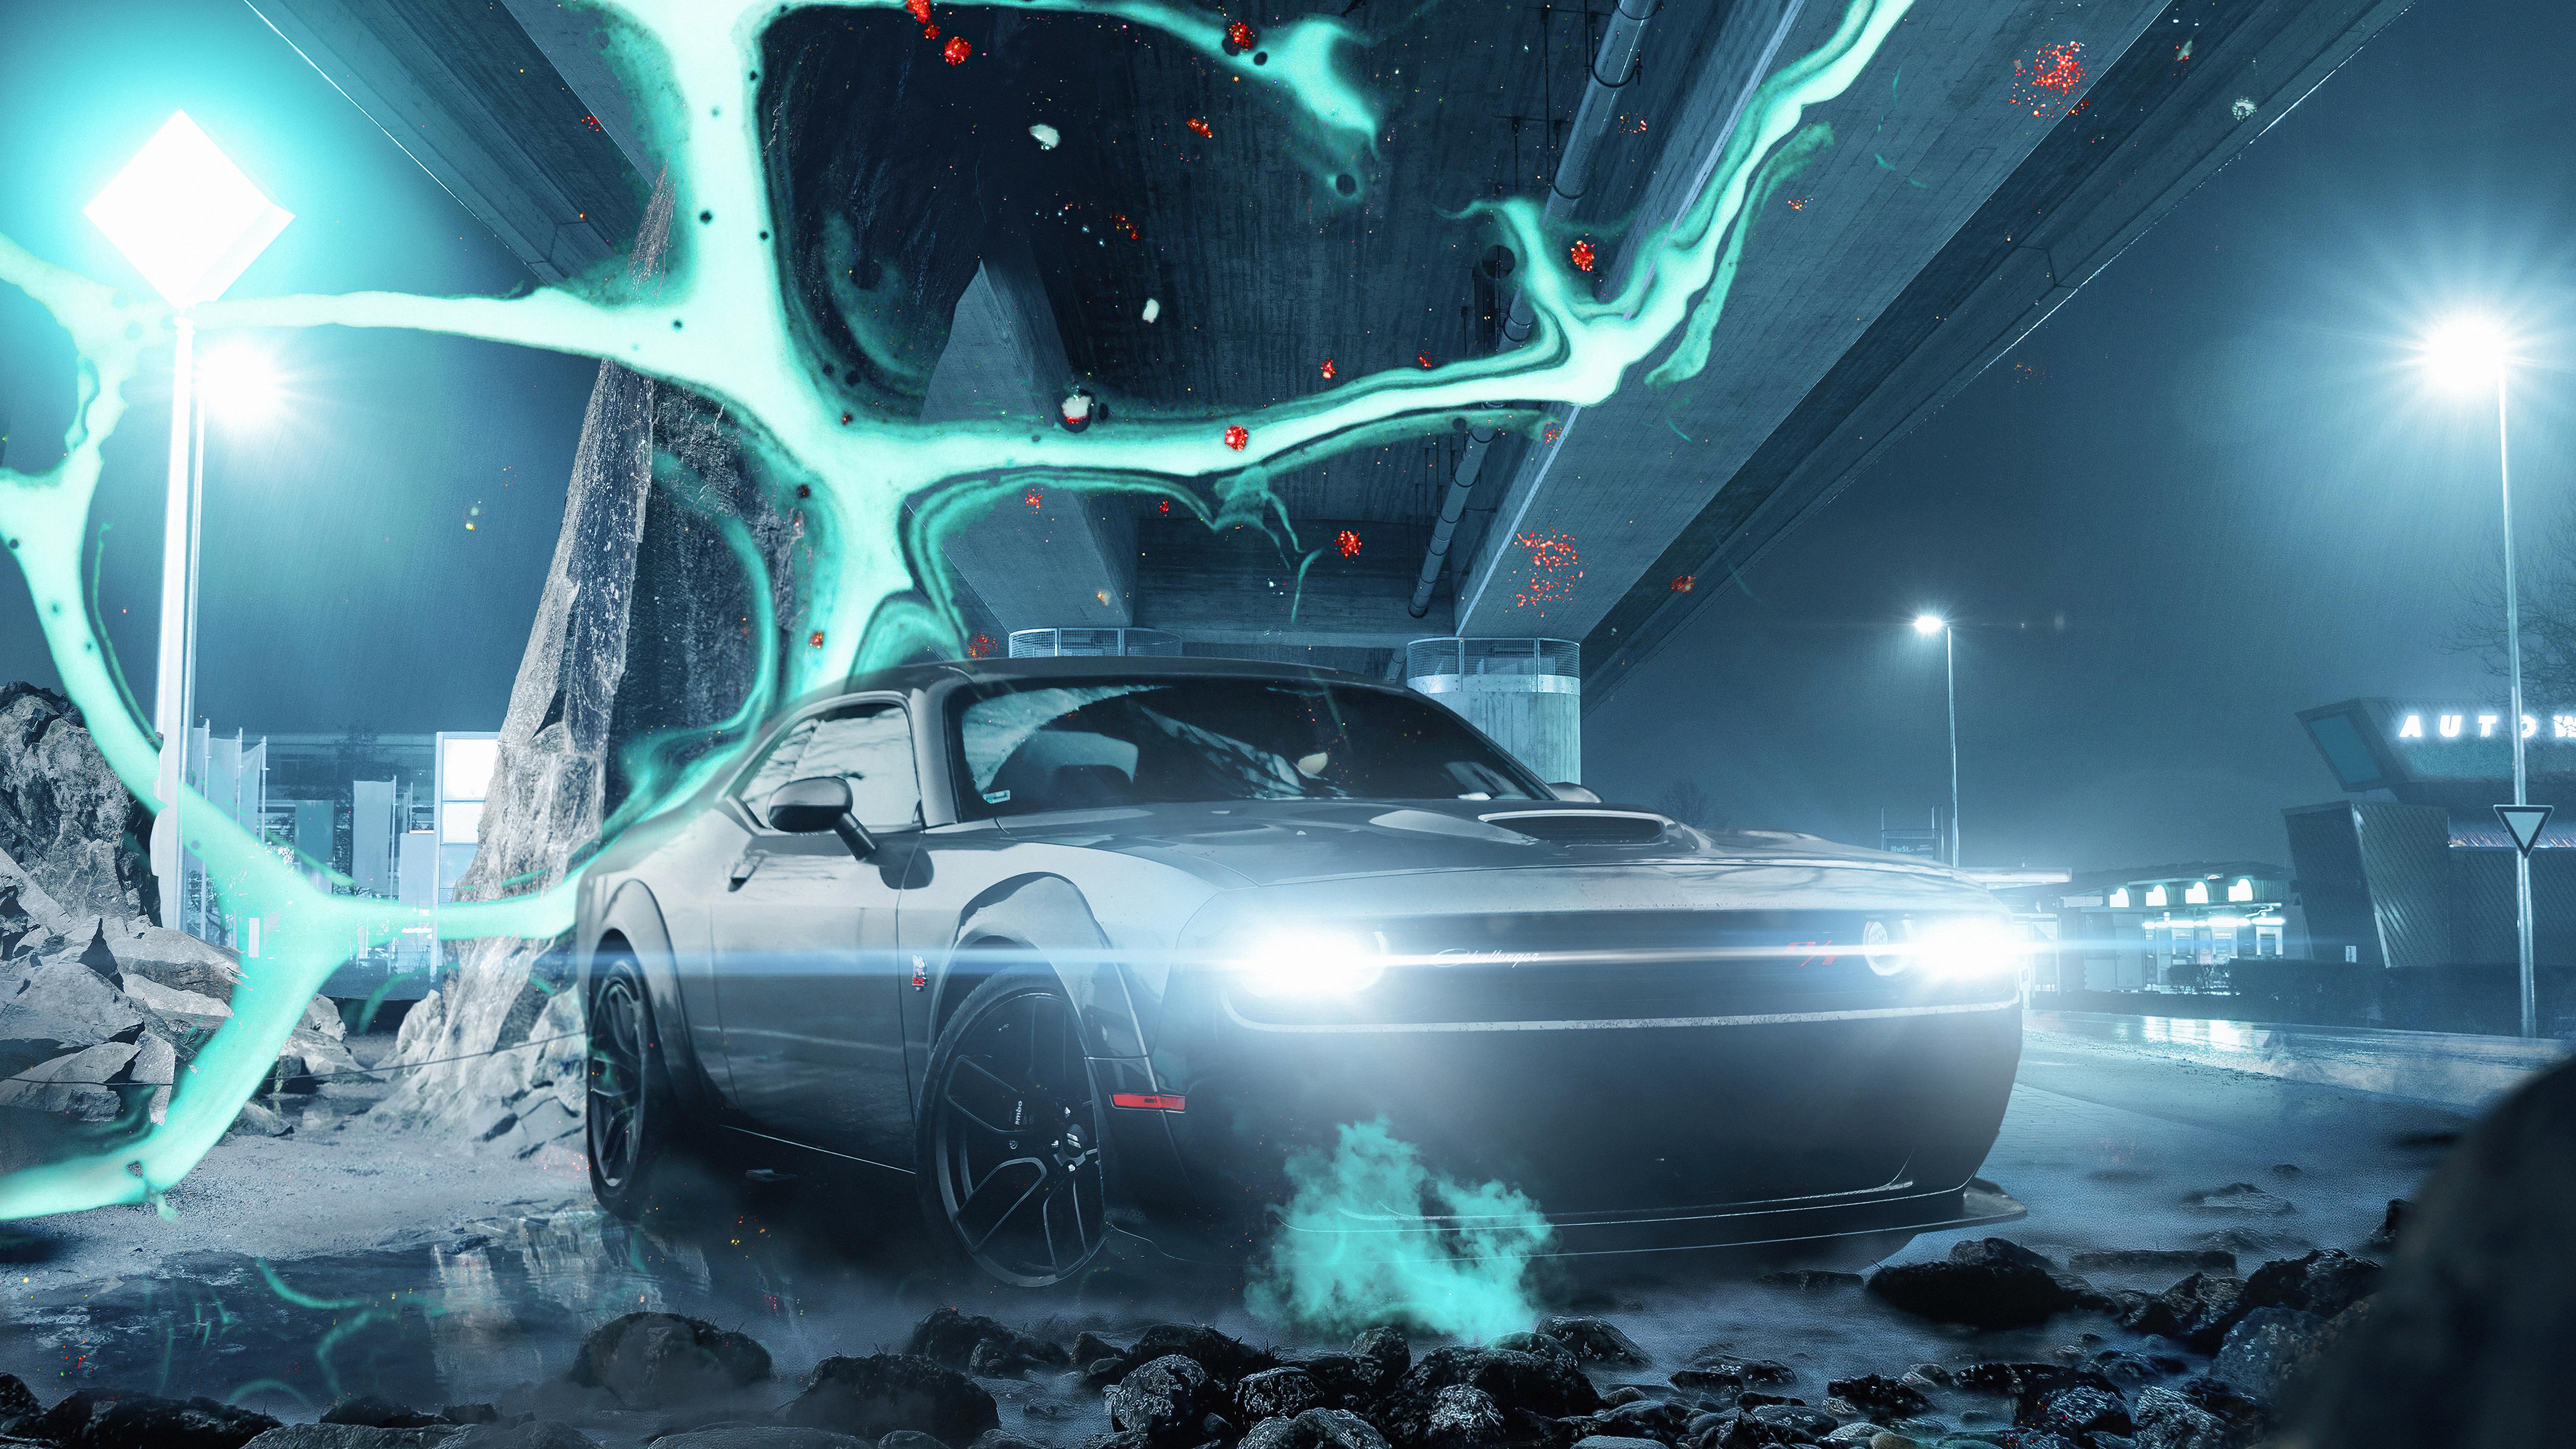 dodge challenger srt energy 4k 1618922046 - Dodge Challenger Srt Energy 4k - Dodge Challenger Srt Energy 4k wallpapers